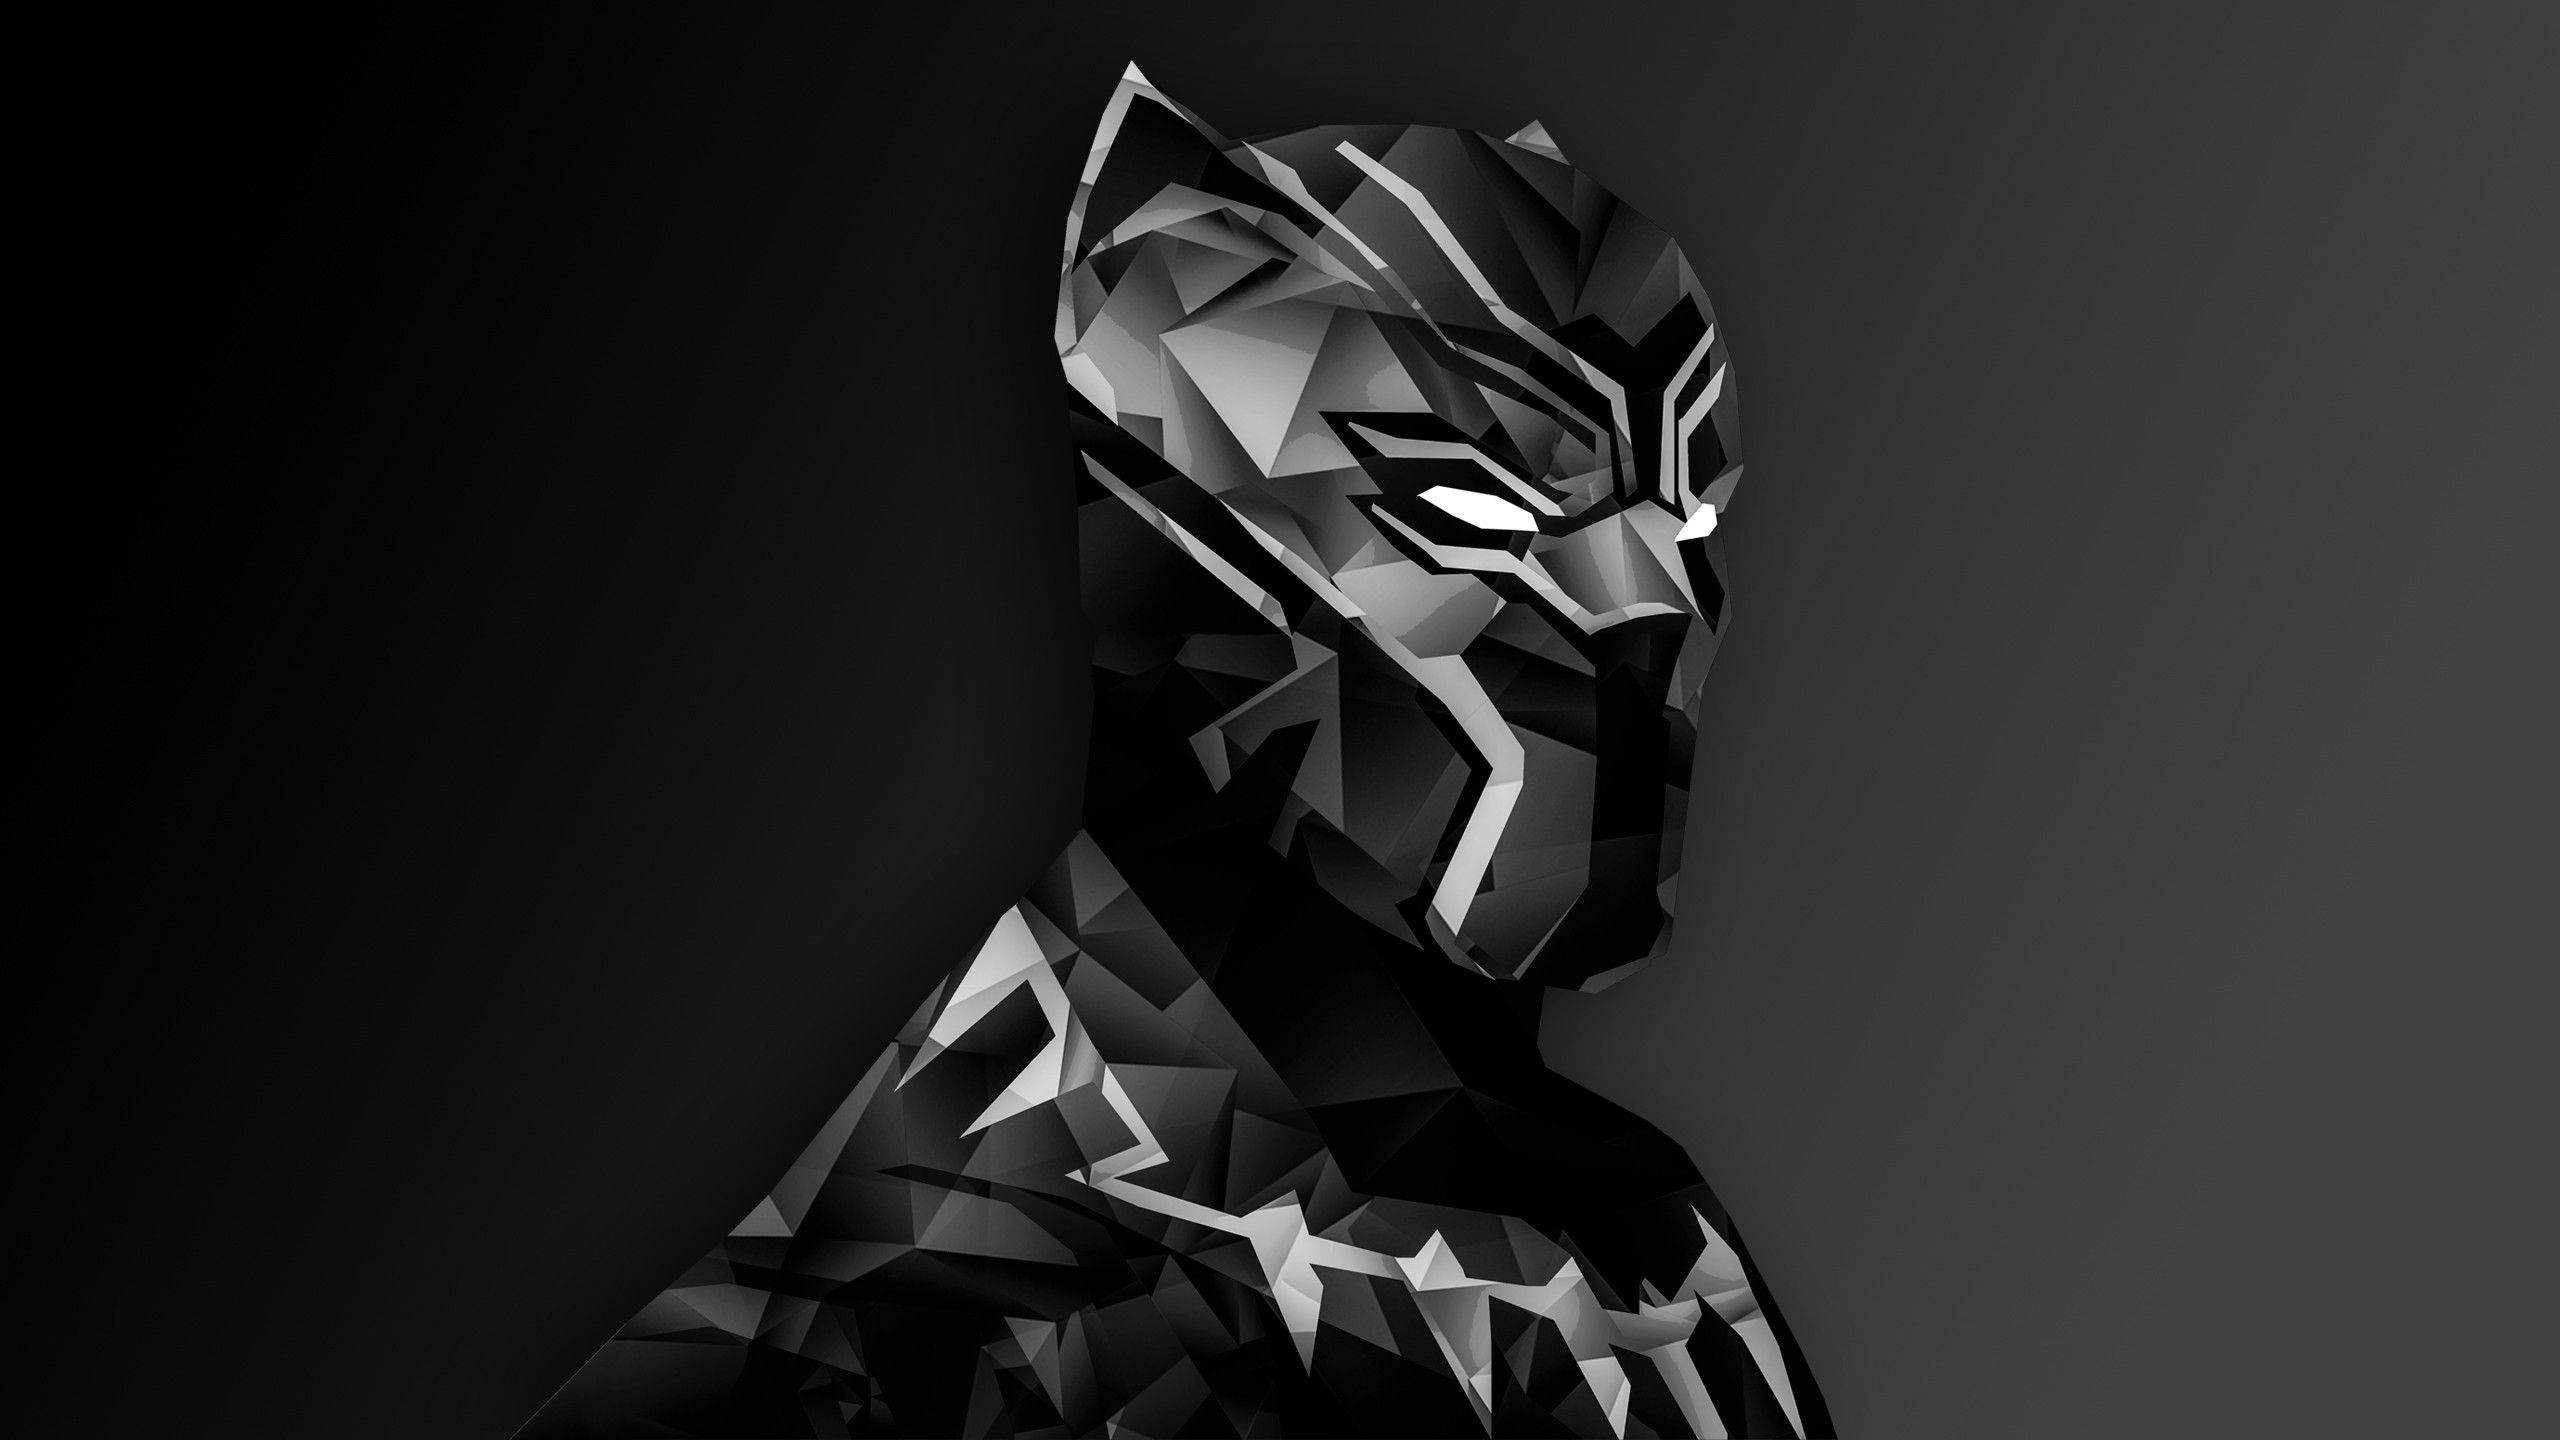 Black Panther Digital Art Wallpaper | Superheroes HD ...